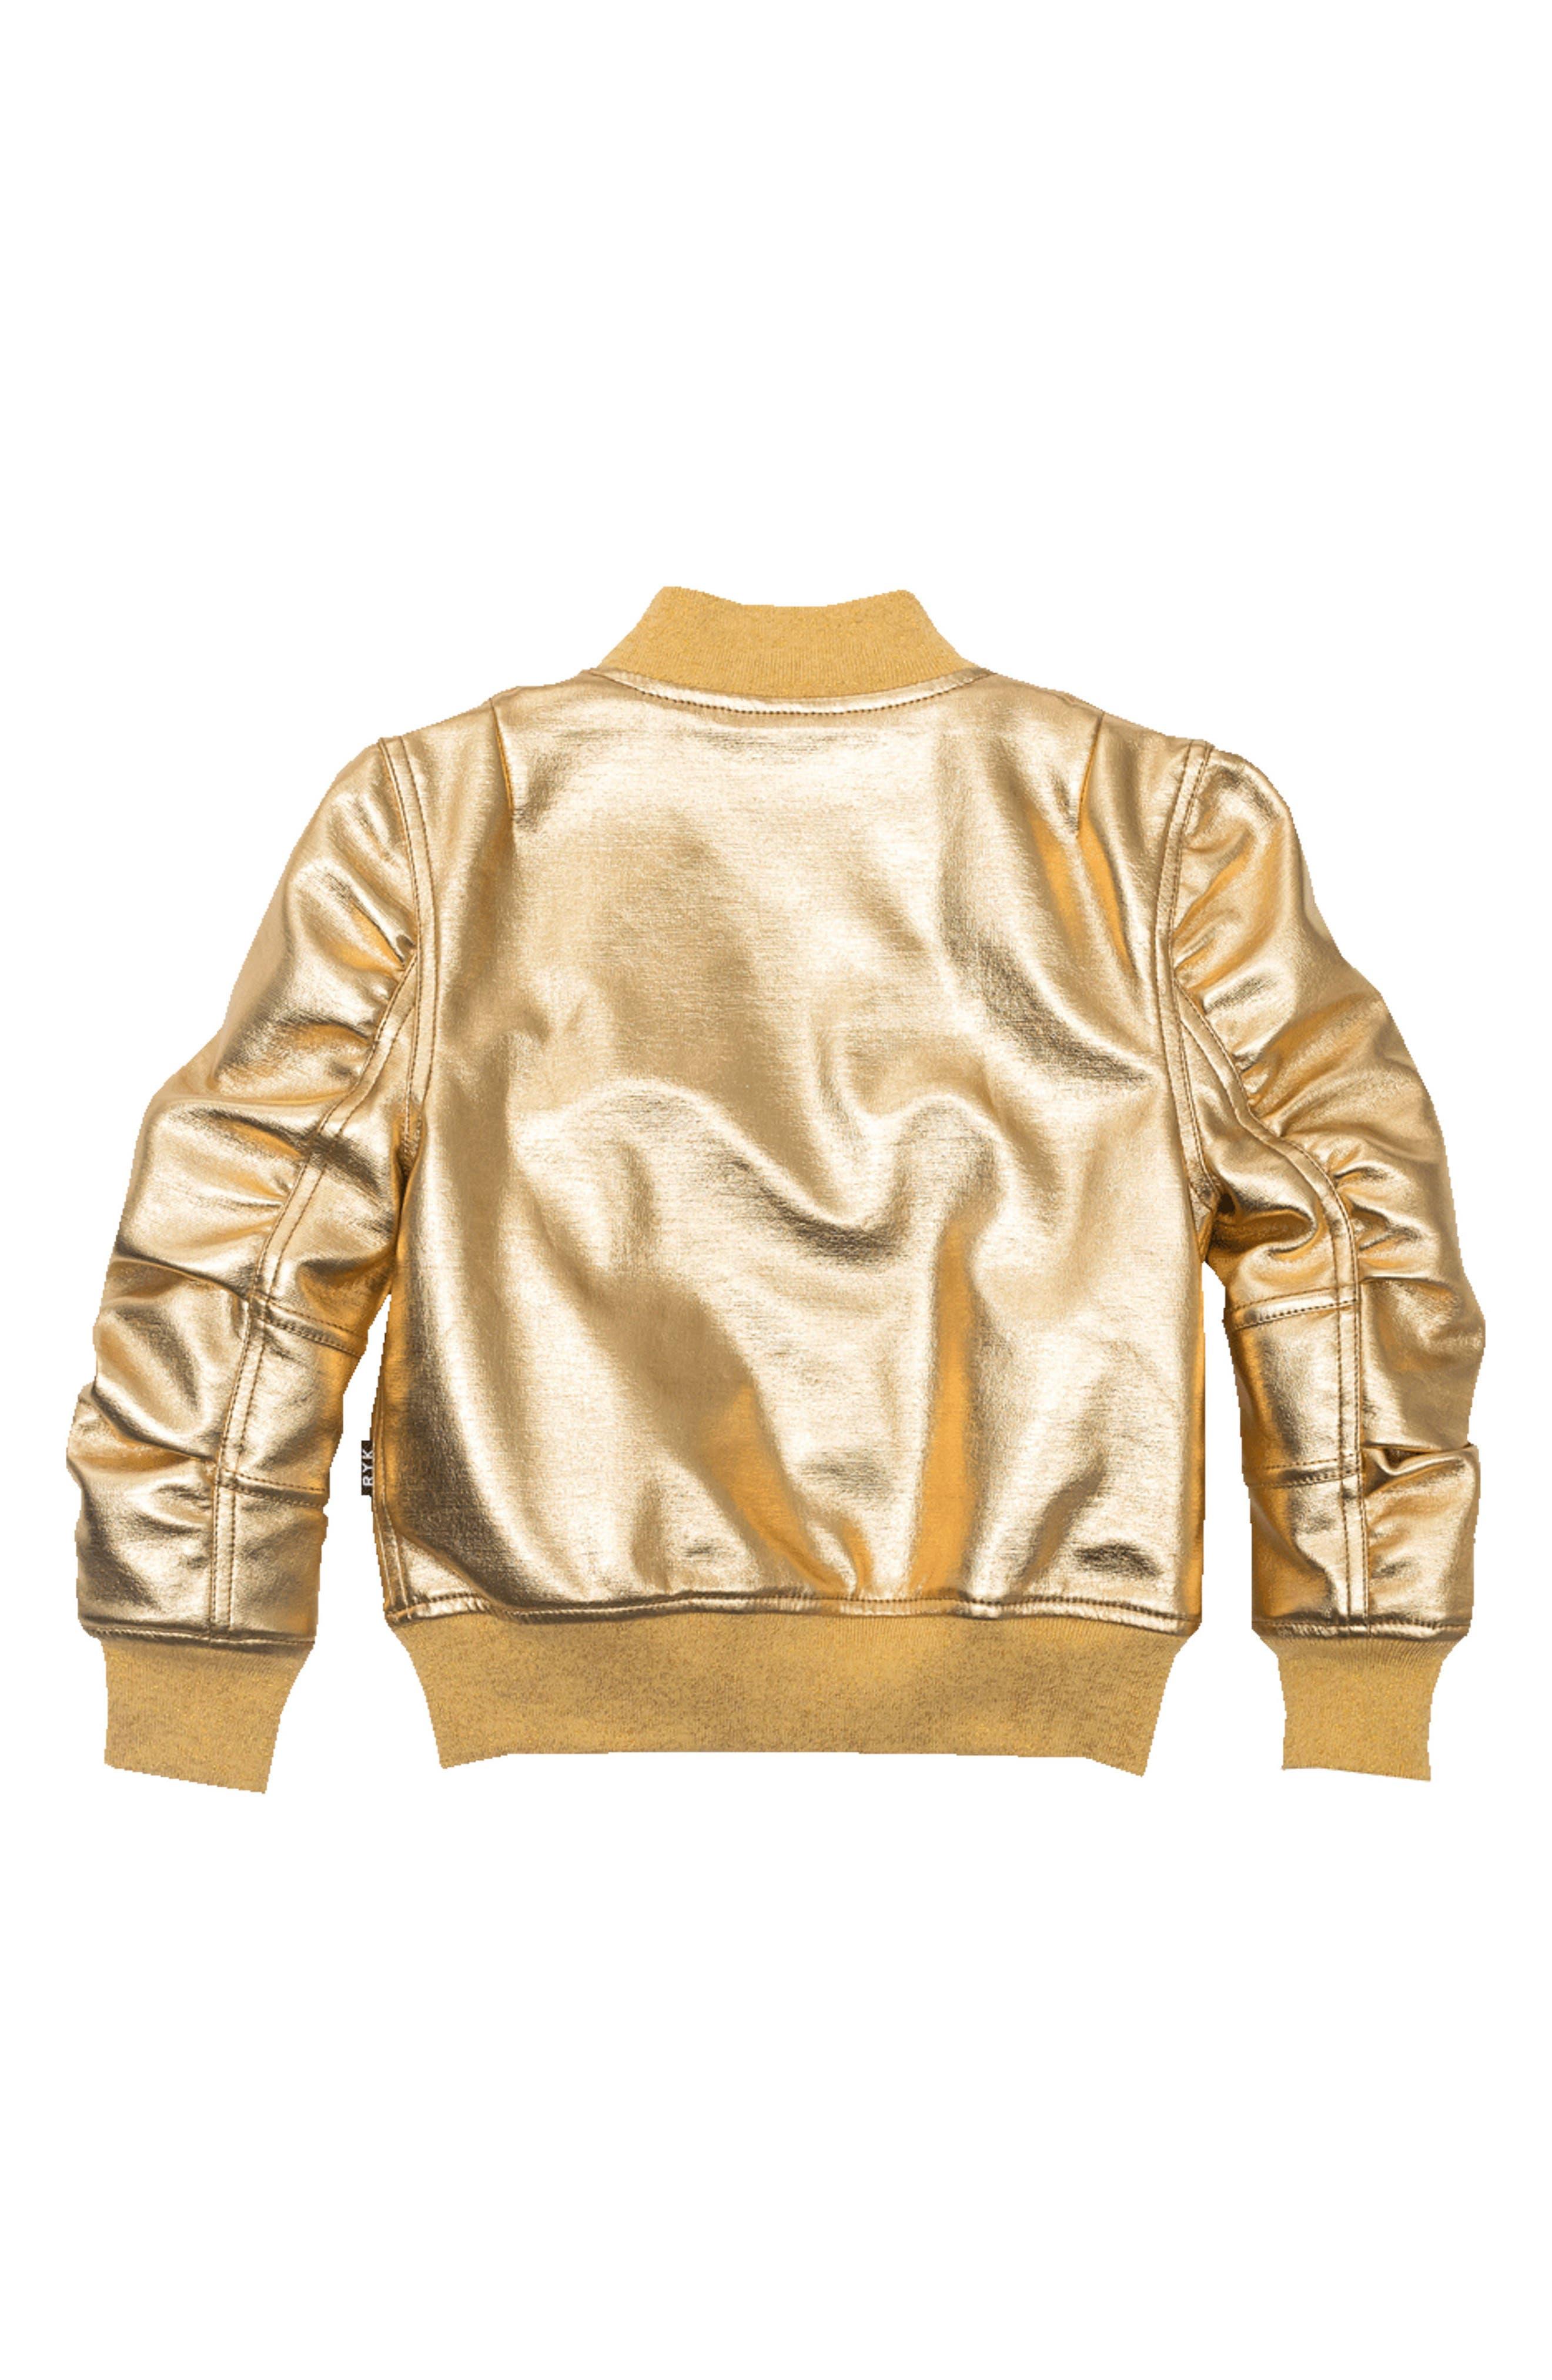 Studio 54 Bomber Jacket,                             Alternate thumbnail 2, color,                             Gold